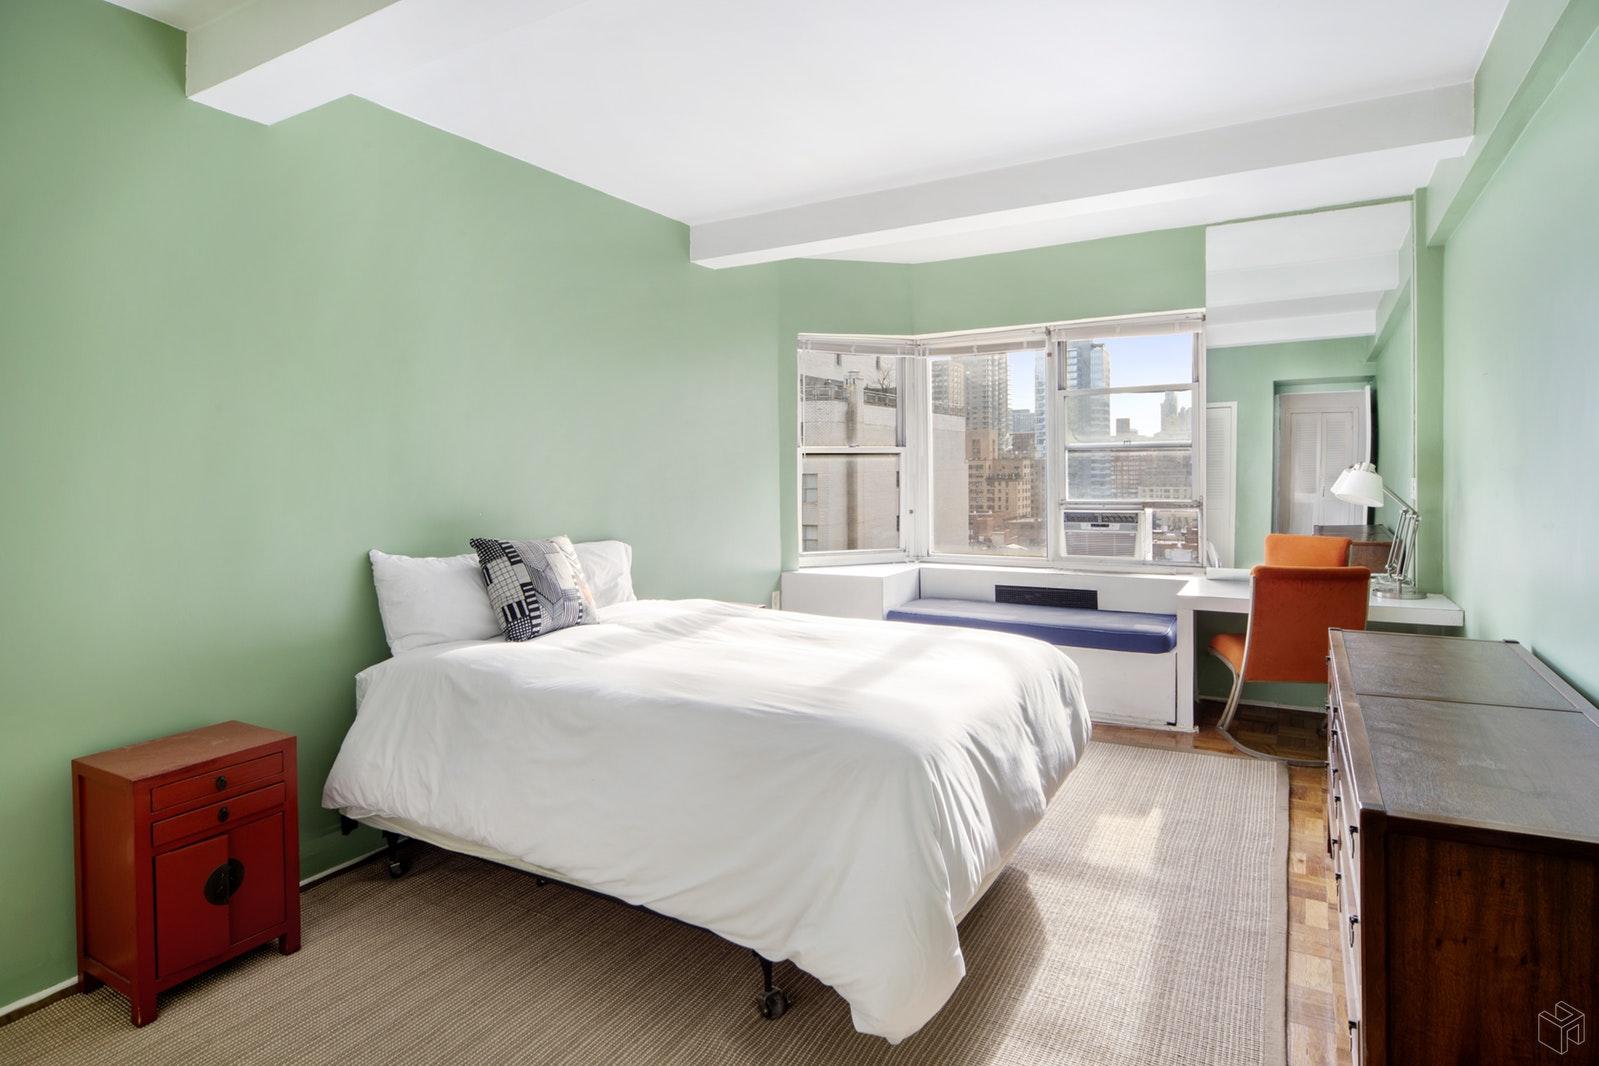 215 EAST 79TH STREET 15B, Upper East Side, $750,000, Web #: 19316242